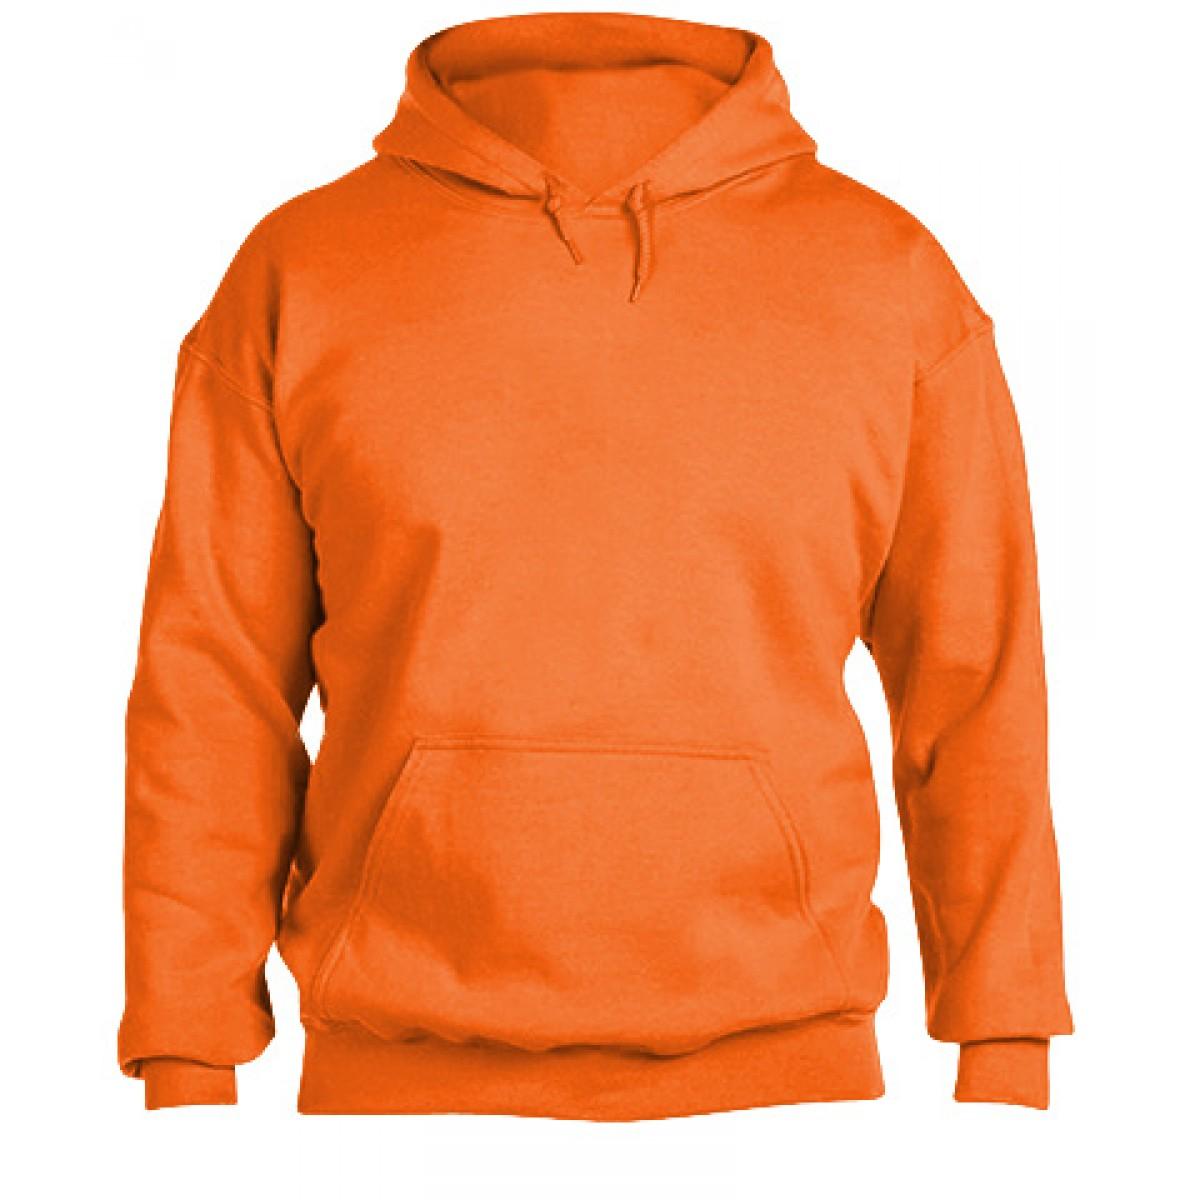 Hooded Sweatshirt 50/50 Heavy Blend-Safety Orange-L